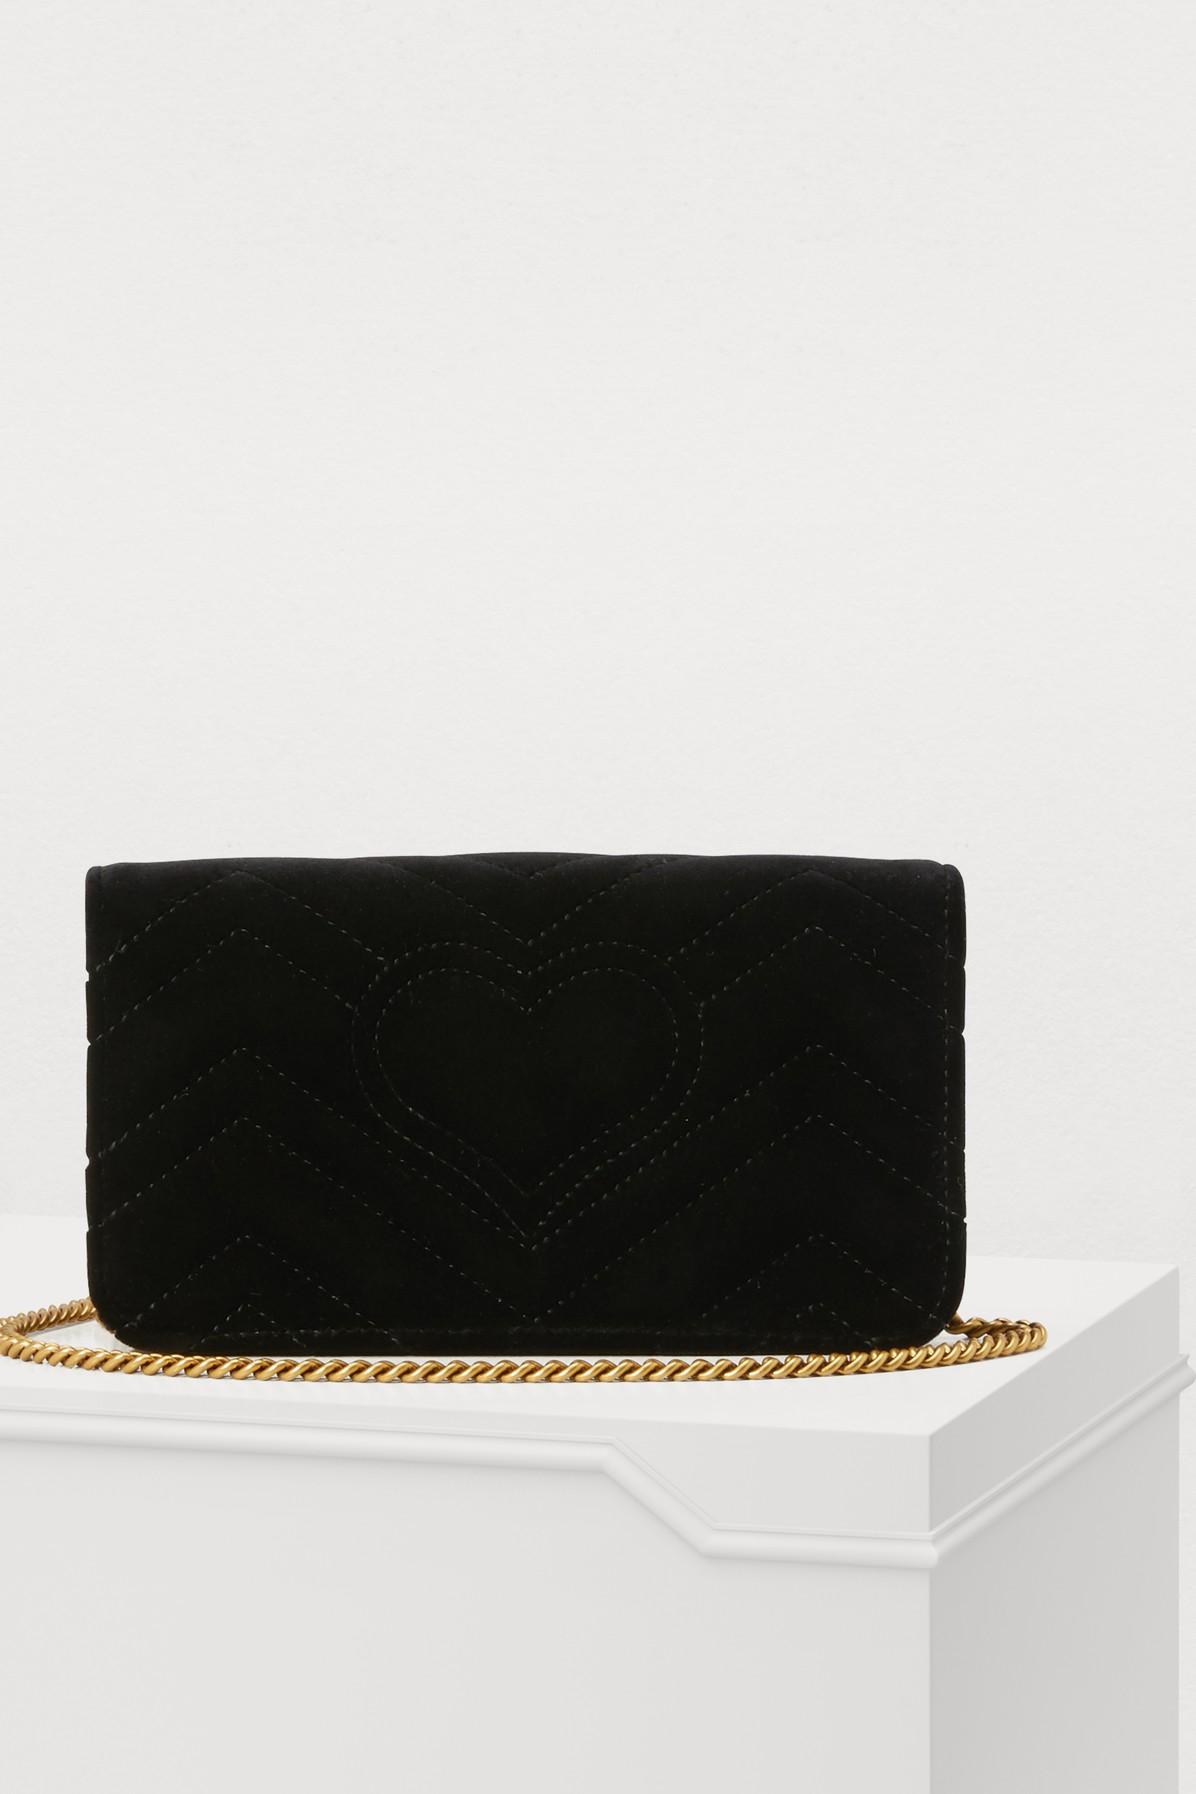 ef63faafe6f Gucci - Black GG Marmont Velvet Supermini Bag - Lyst. View fullscreen